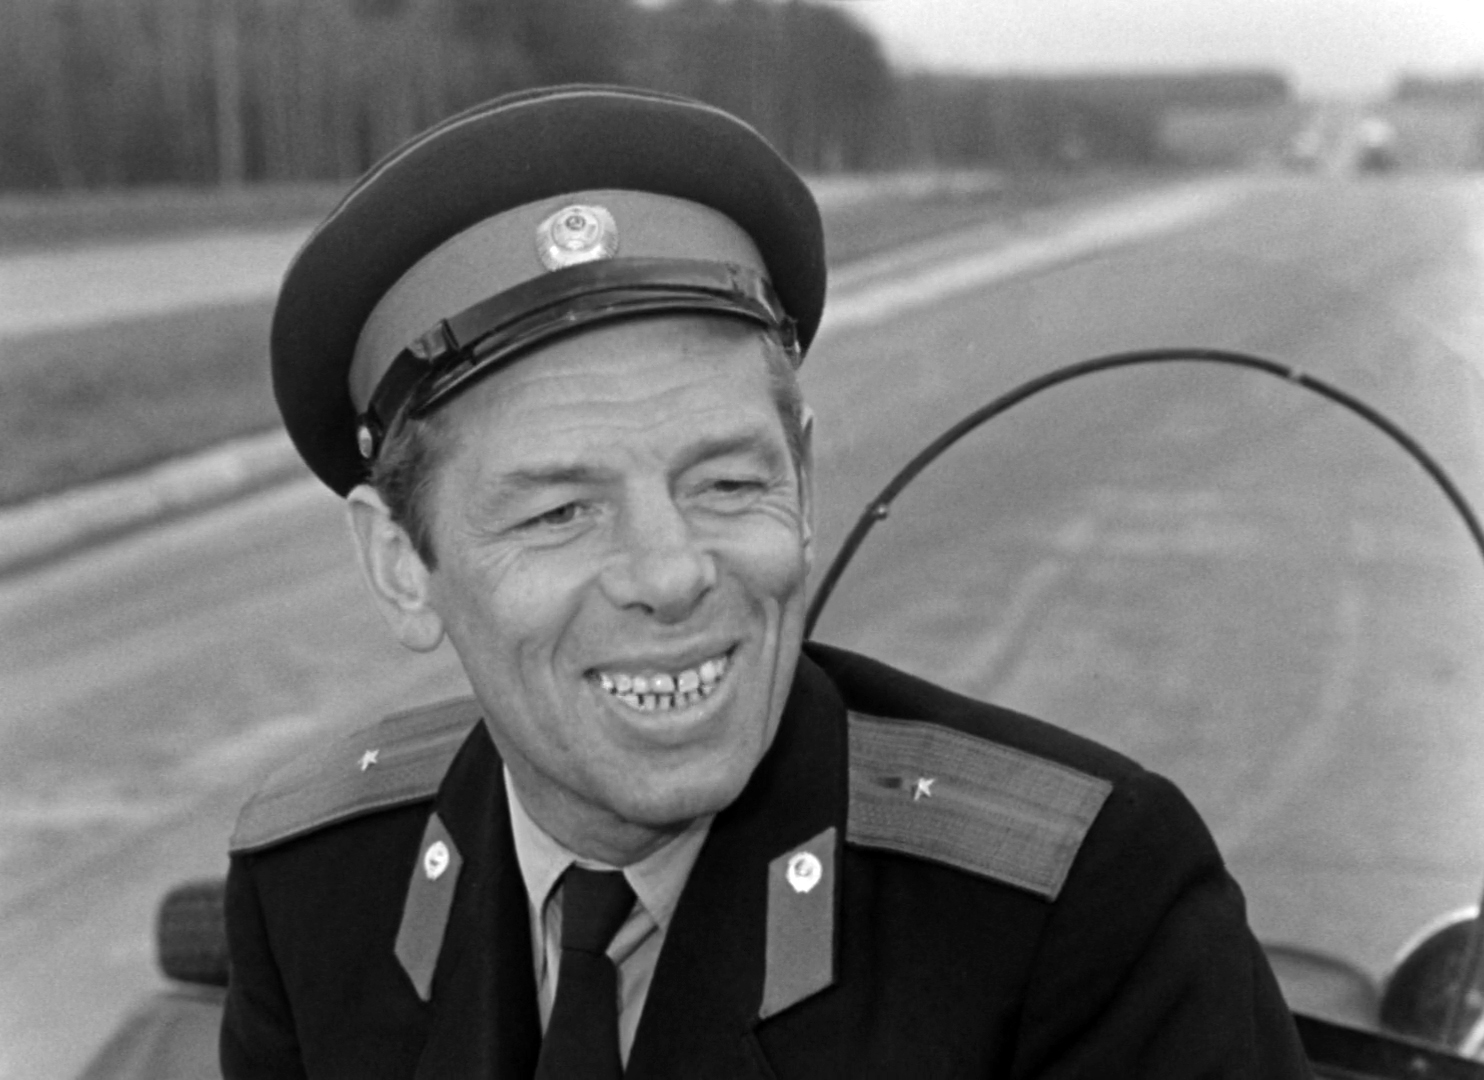 Zinochka from quotIvan Vasilyevich is changing his professionquot. Photo tests